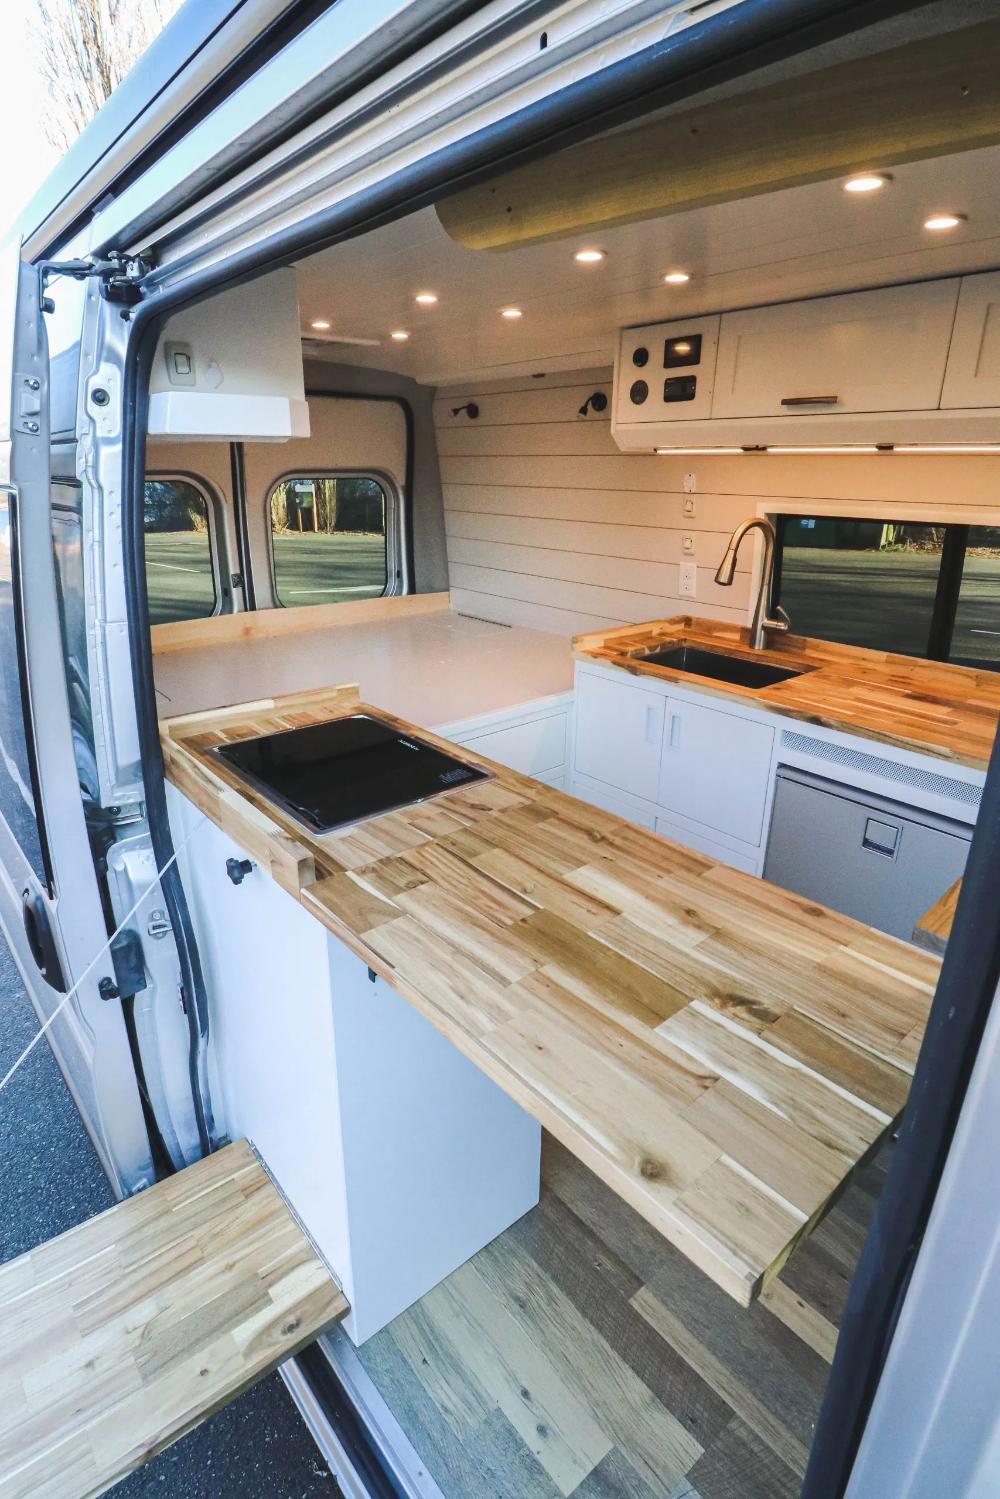 Chongo Freedom Vans Van Interior Van Life Diy Build A Camper Van